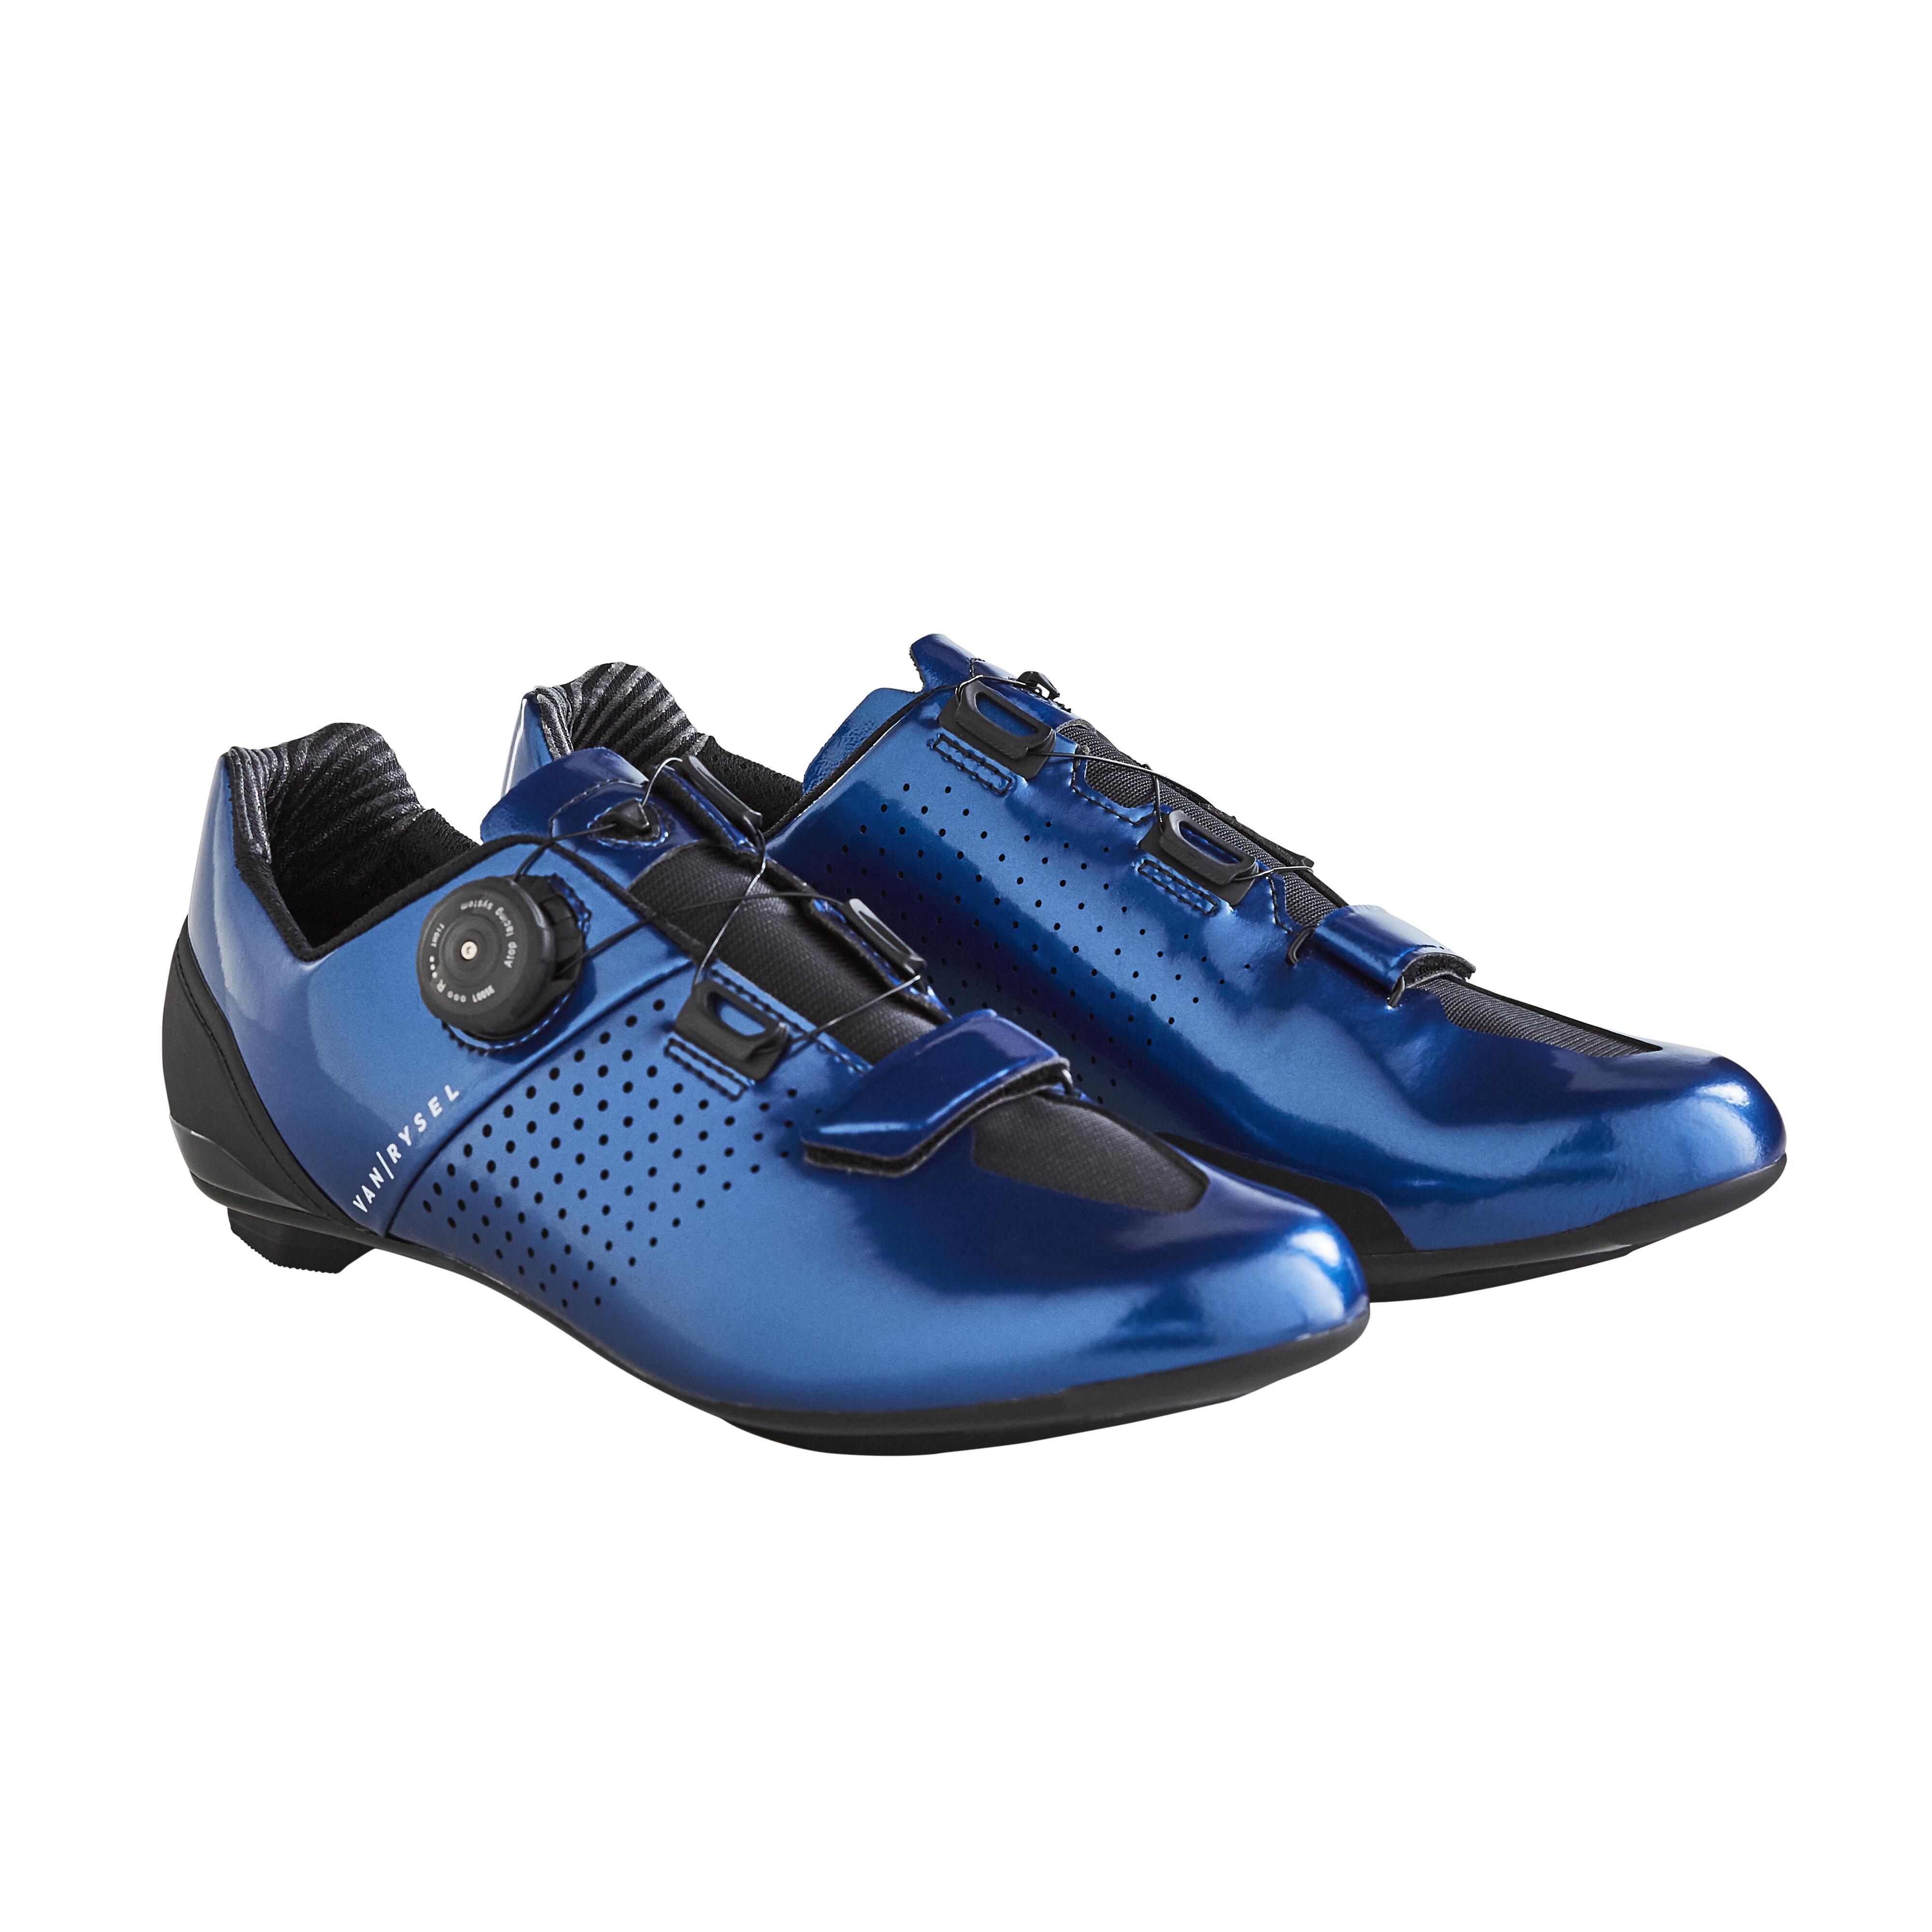 Chaussures de vélo cyclo-sport VAN RYSEL ROADR 520 BLEU